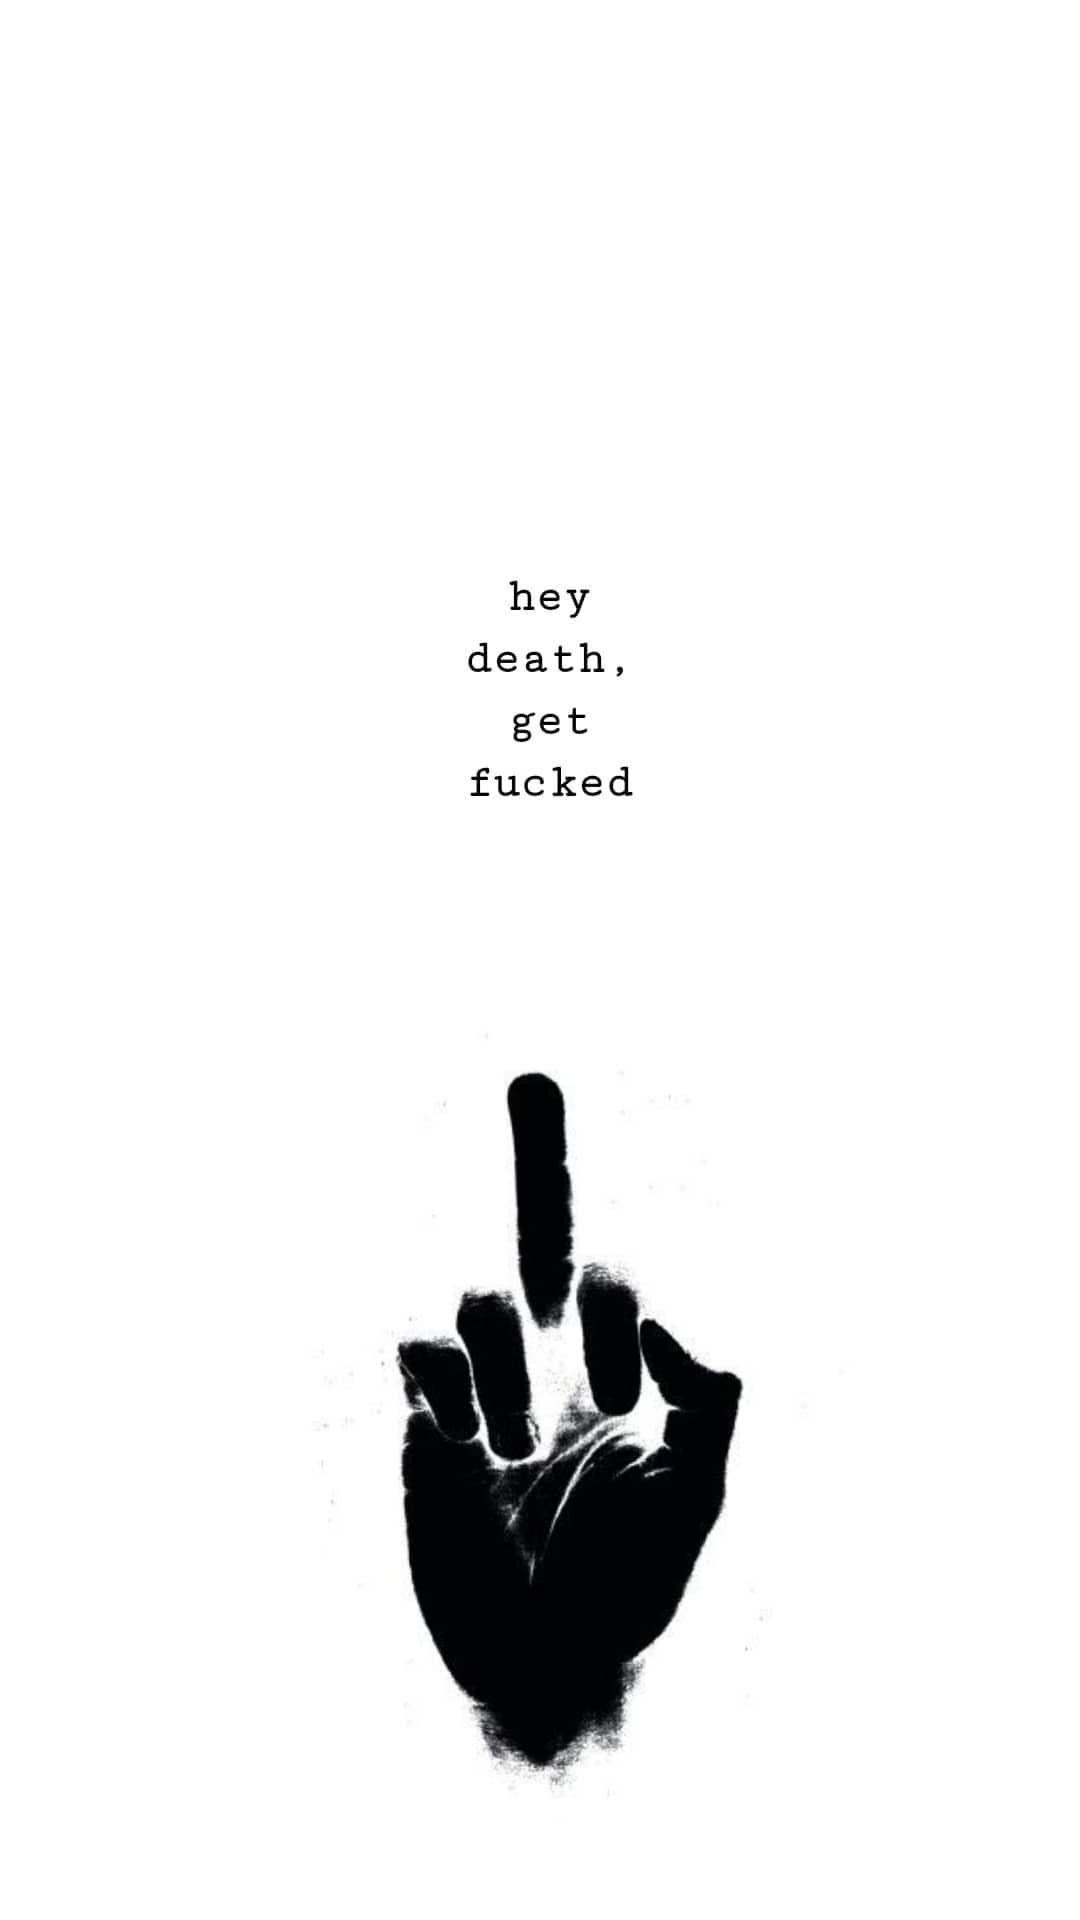 Hey Death Get Fucked The Amity Affliction Taa Theamityaffliction Wallpaper Followforfollow